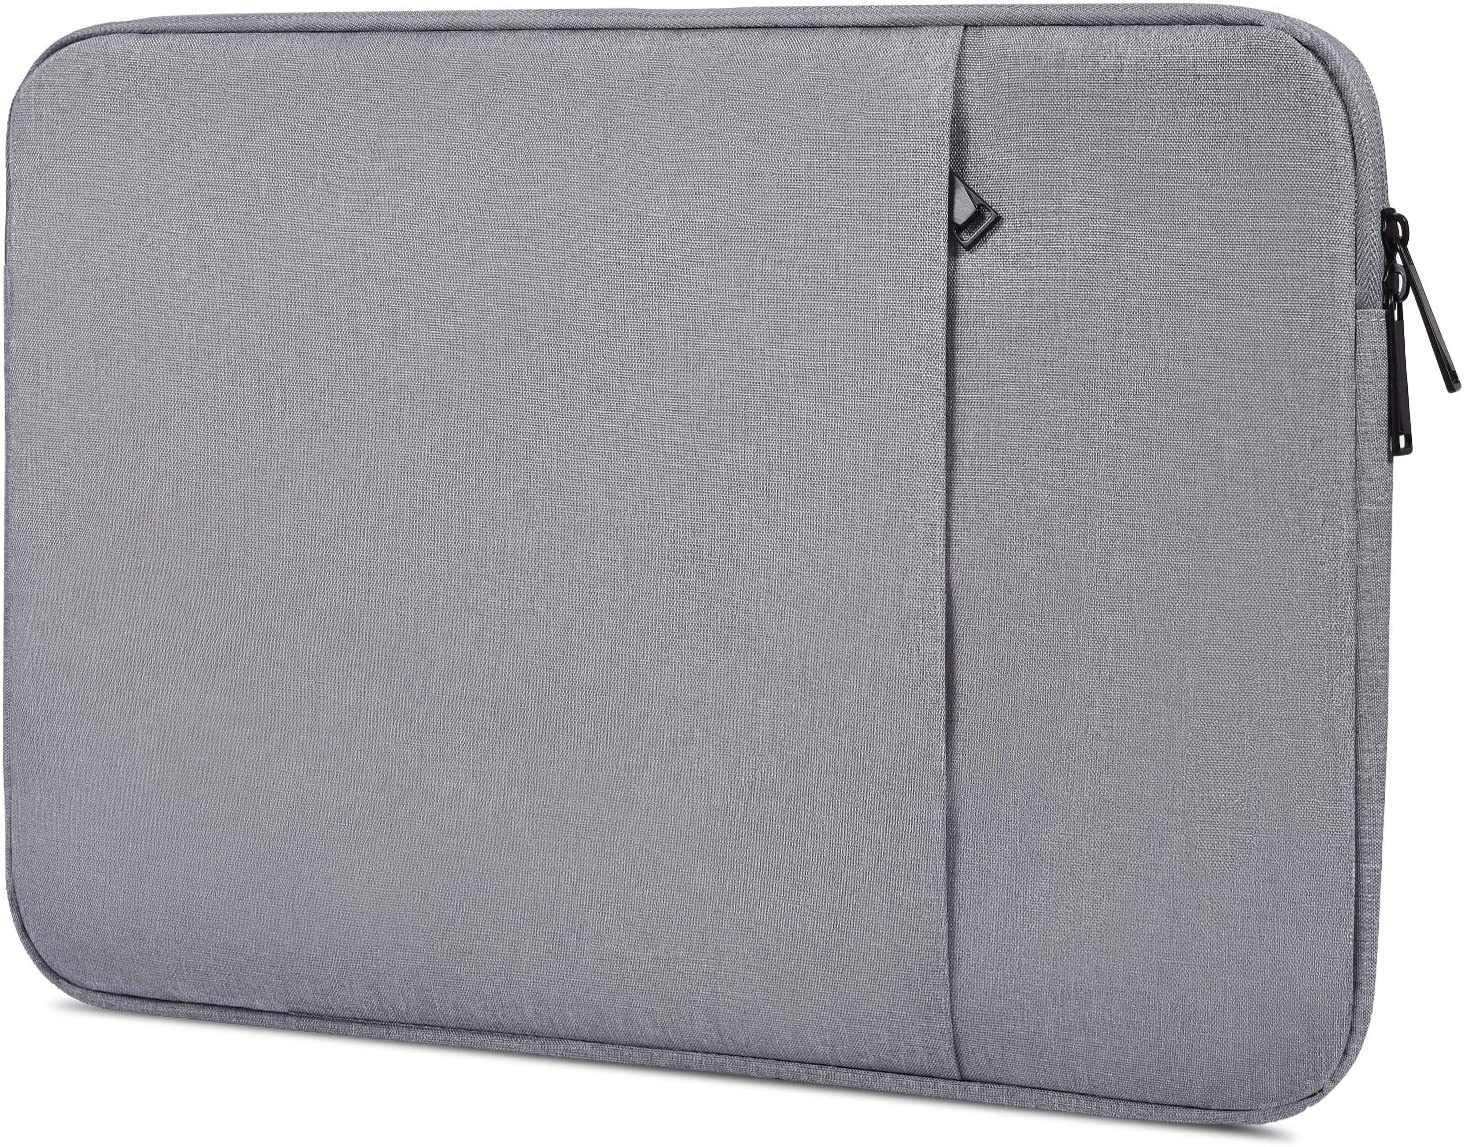 "13.3 Inch Waterpoof Laptop Bag for DELL XPS 9380 / Latitude 13.3 / Inspiron 13 5000, Lenovo Yoga 730/720 13.3, HP ENVY 13 / Pavilion 13, Surface Laptop 2, ASUS ZenBook 13, 13.3"" Laptop Carrying Bag"